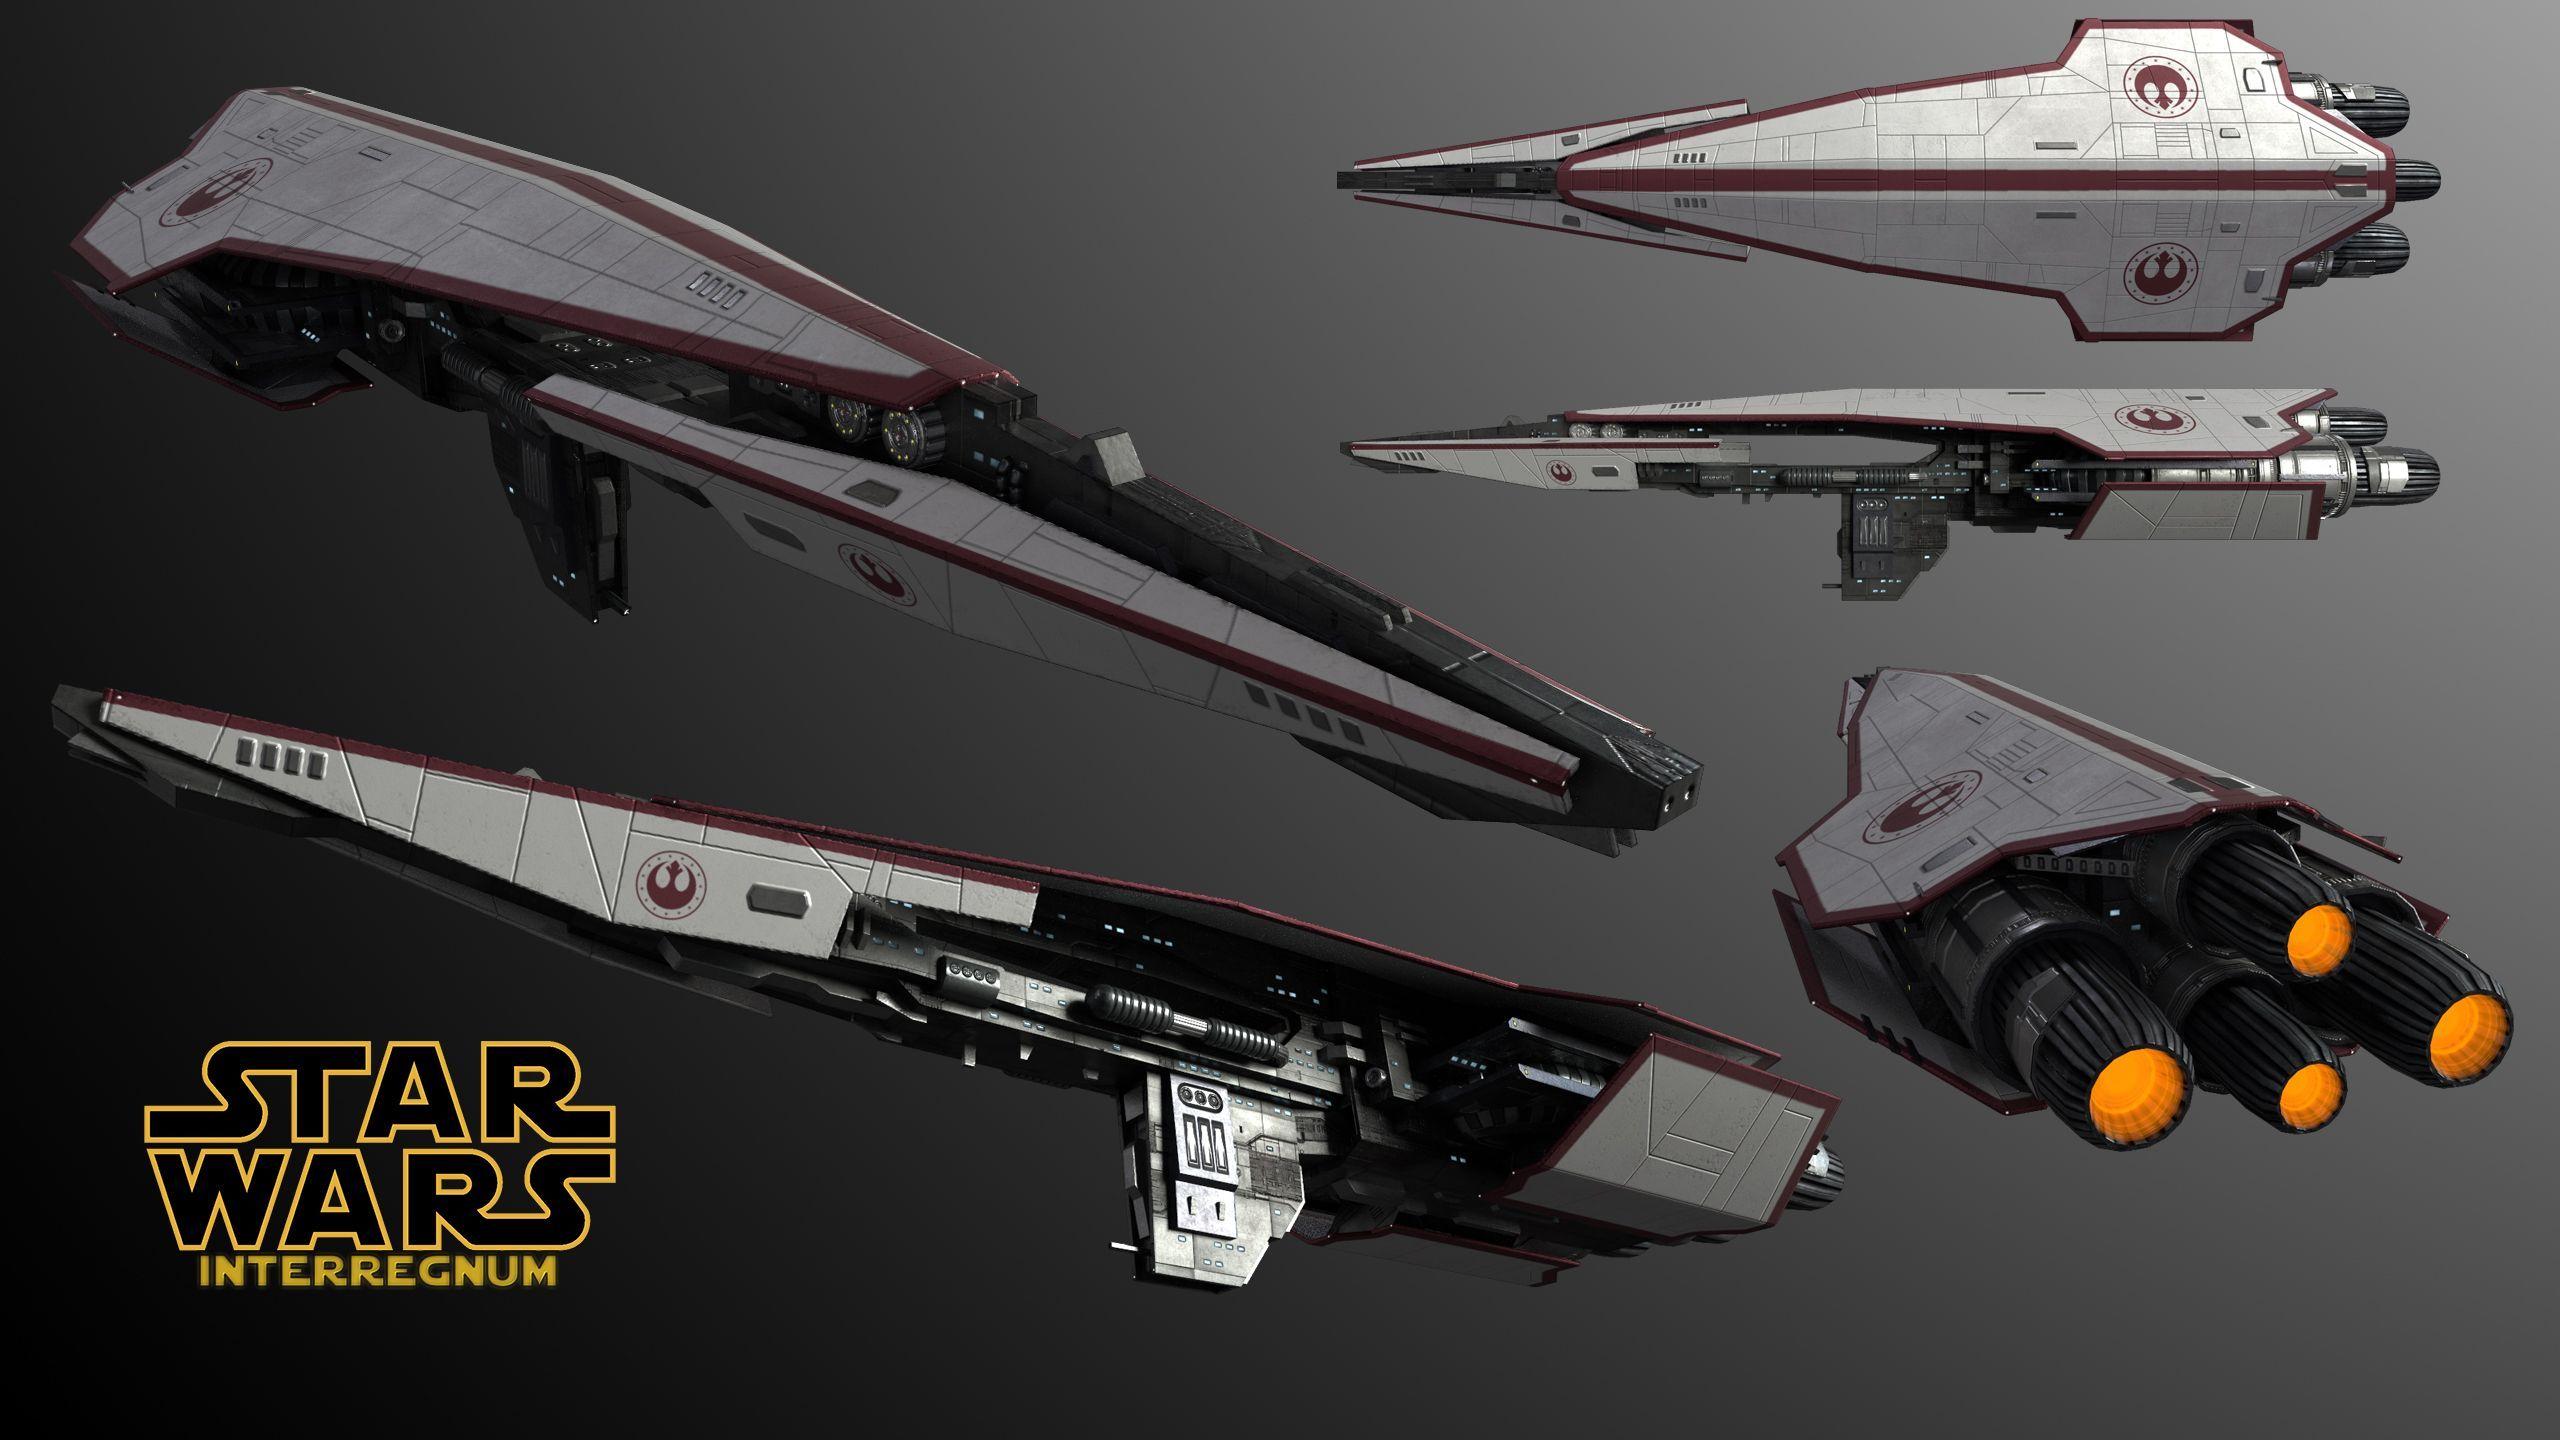 Tattoos For Men Army Star In 2020 Star Wars Vehicles Star Wars Ships Design Star Wars Artwork